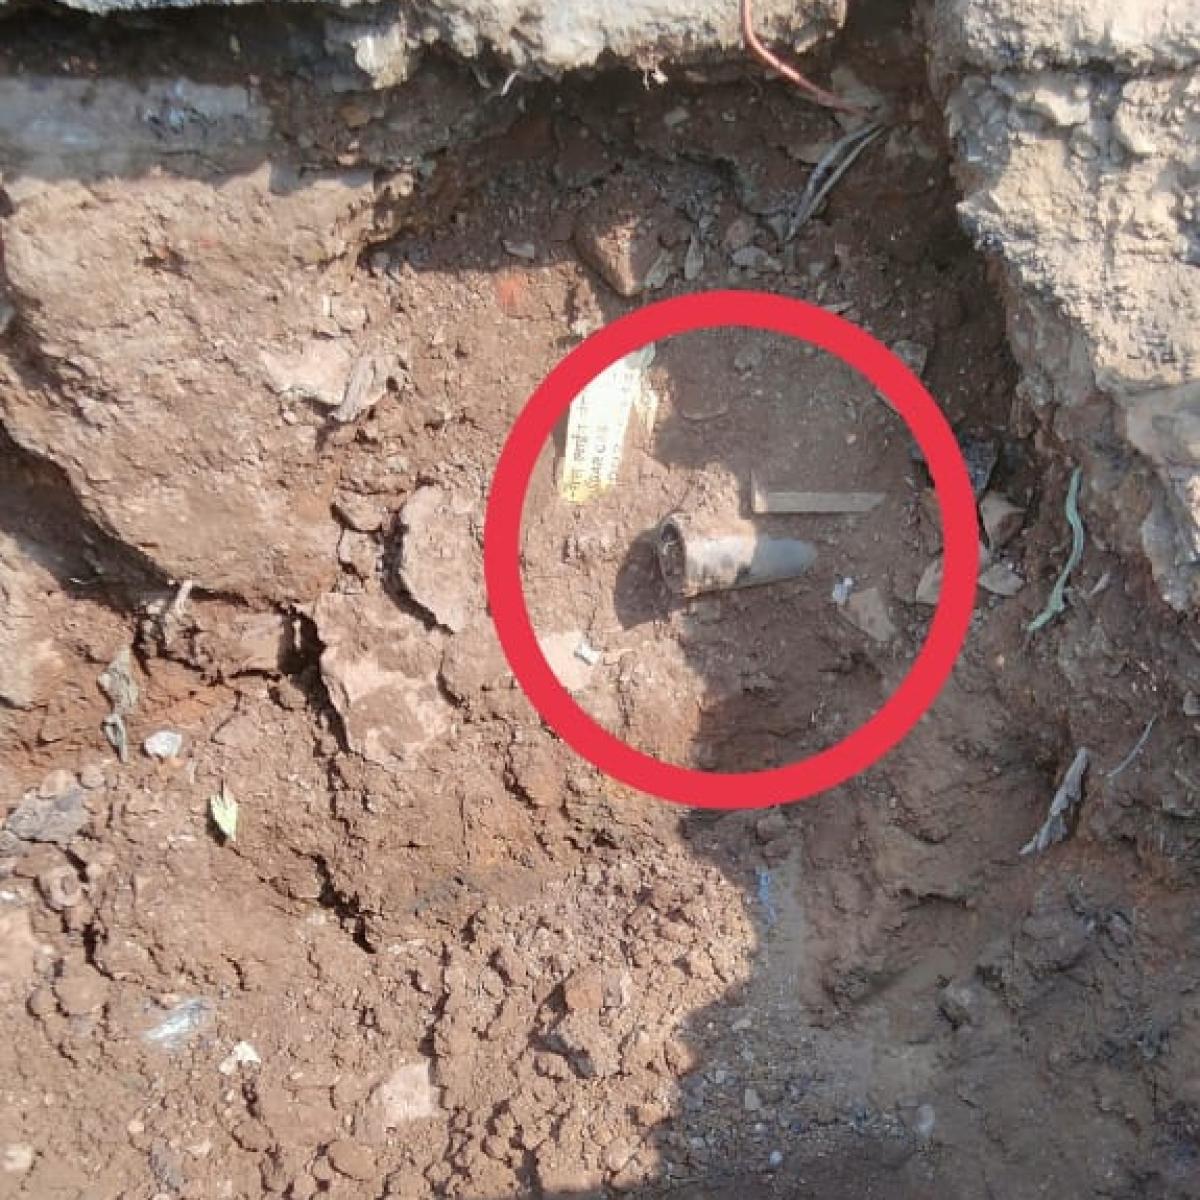 Thane: Mahanagar gas pipeline opposite to TMC chief's bungalow damaged